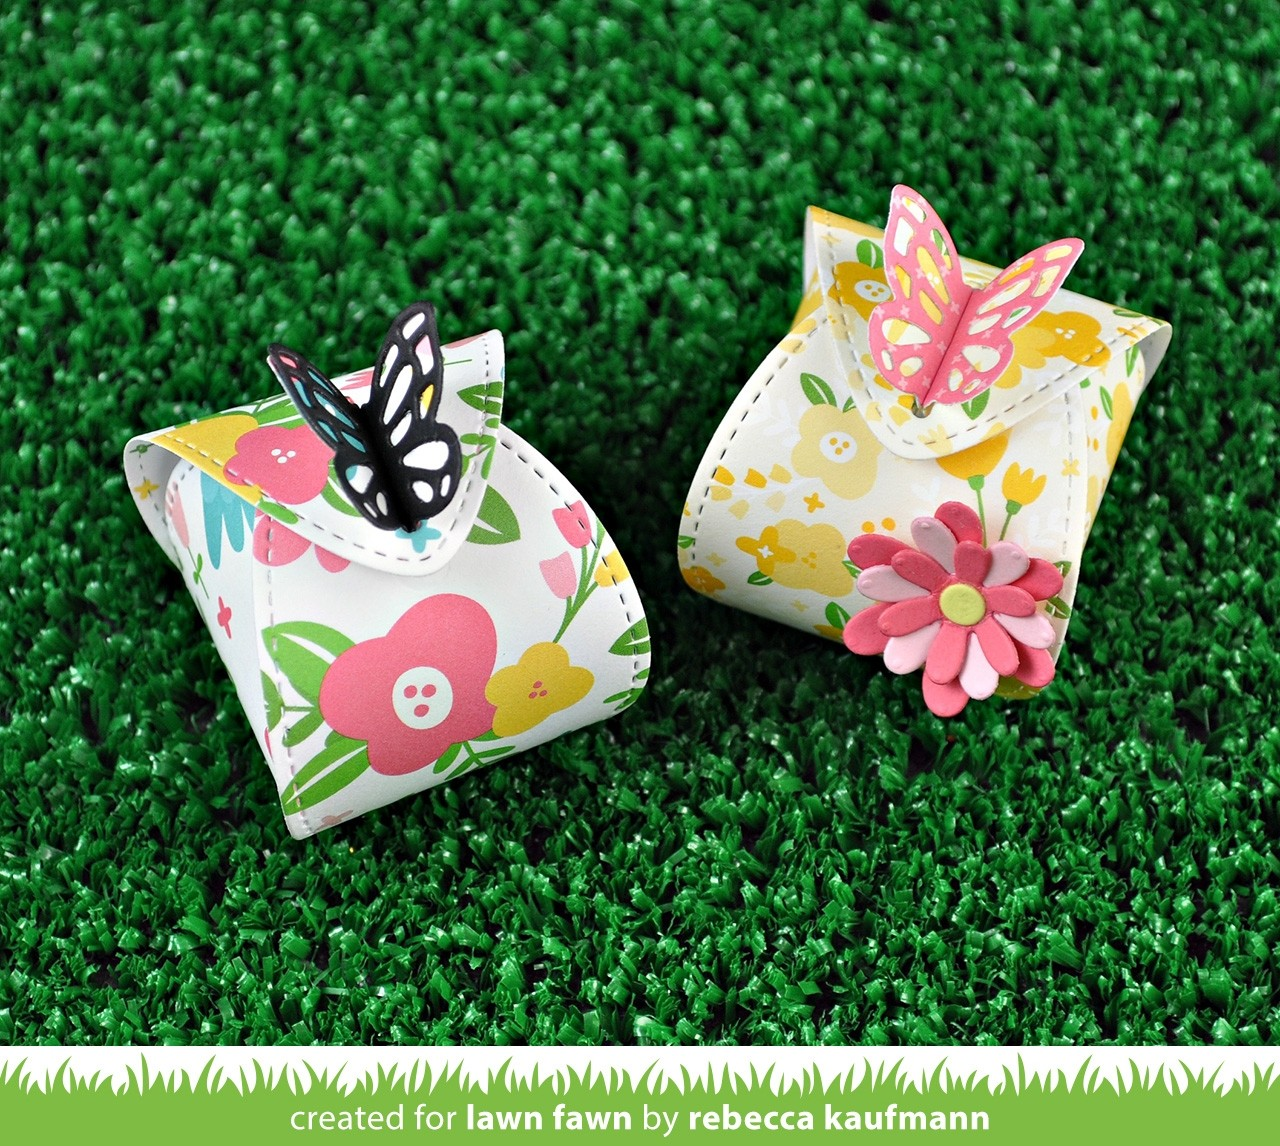 Lawn Fawn butterfly treat box die